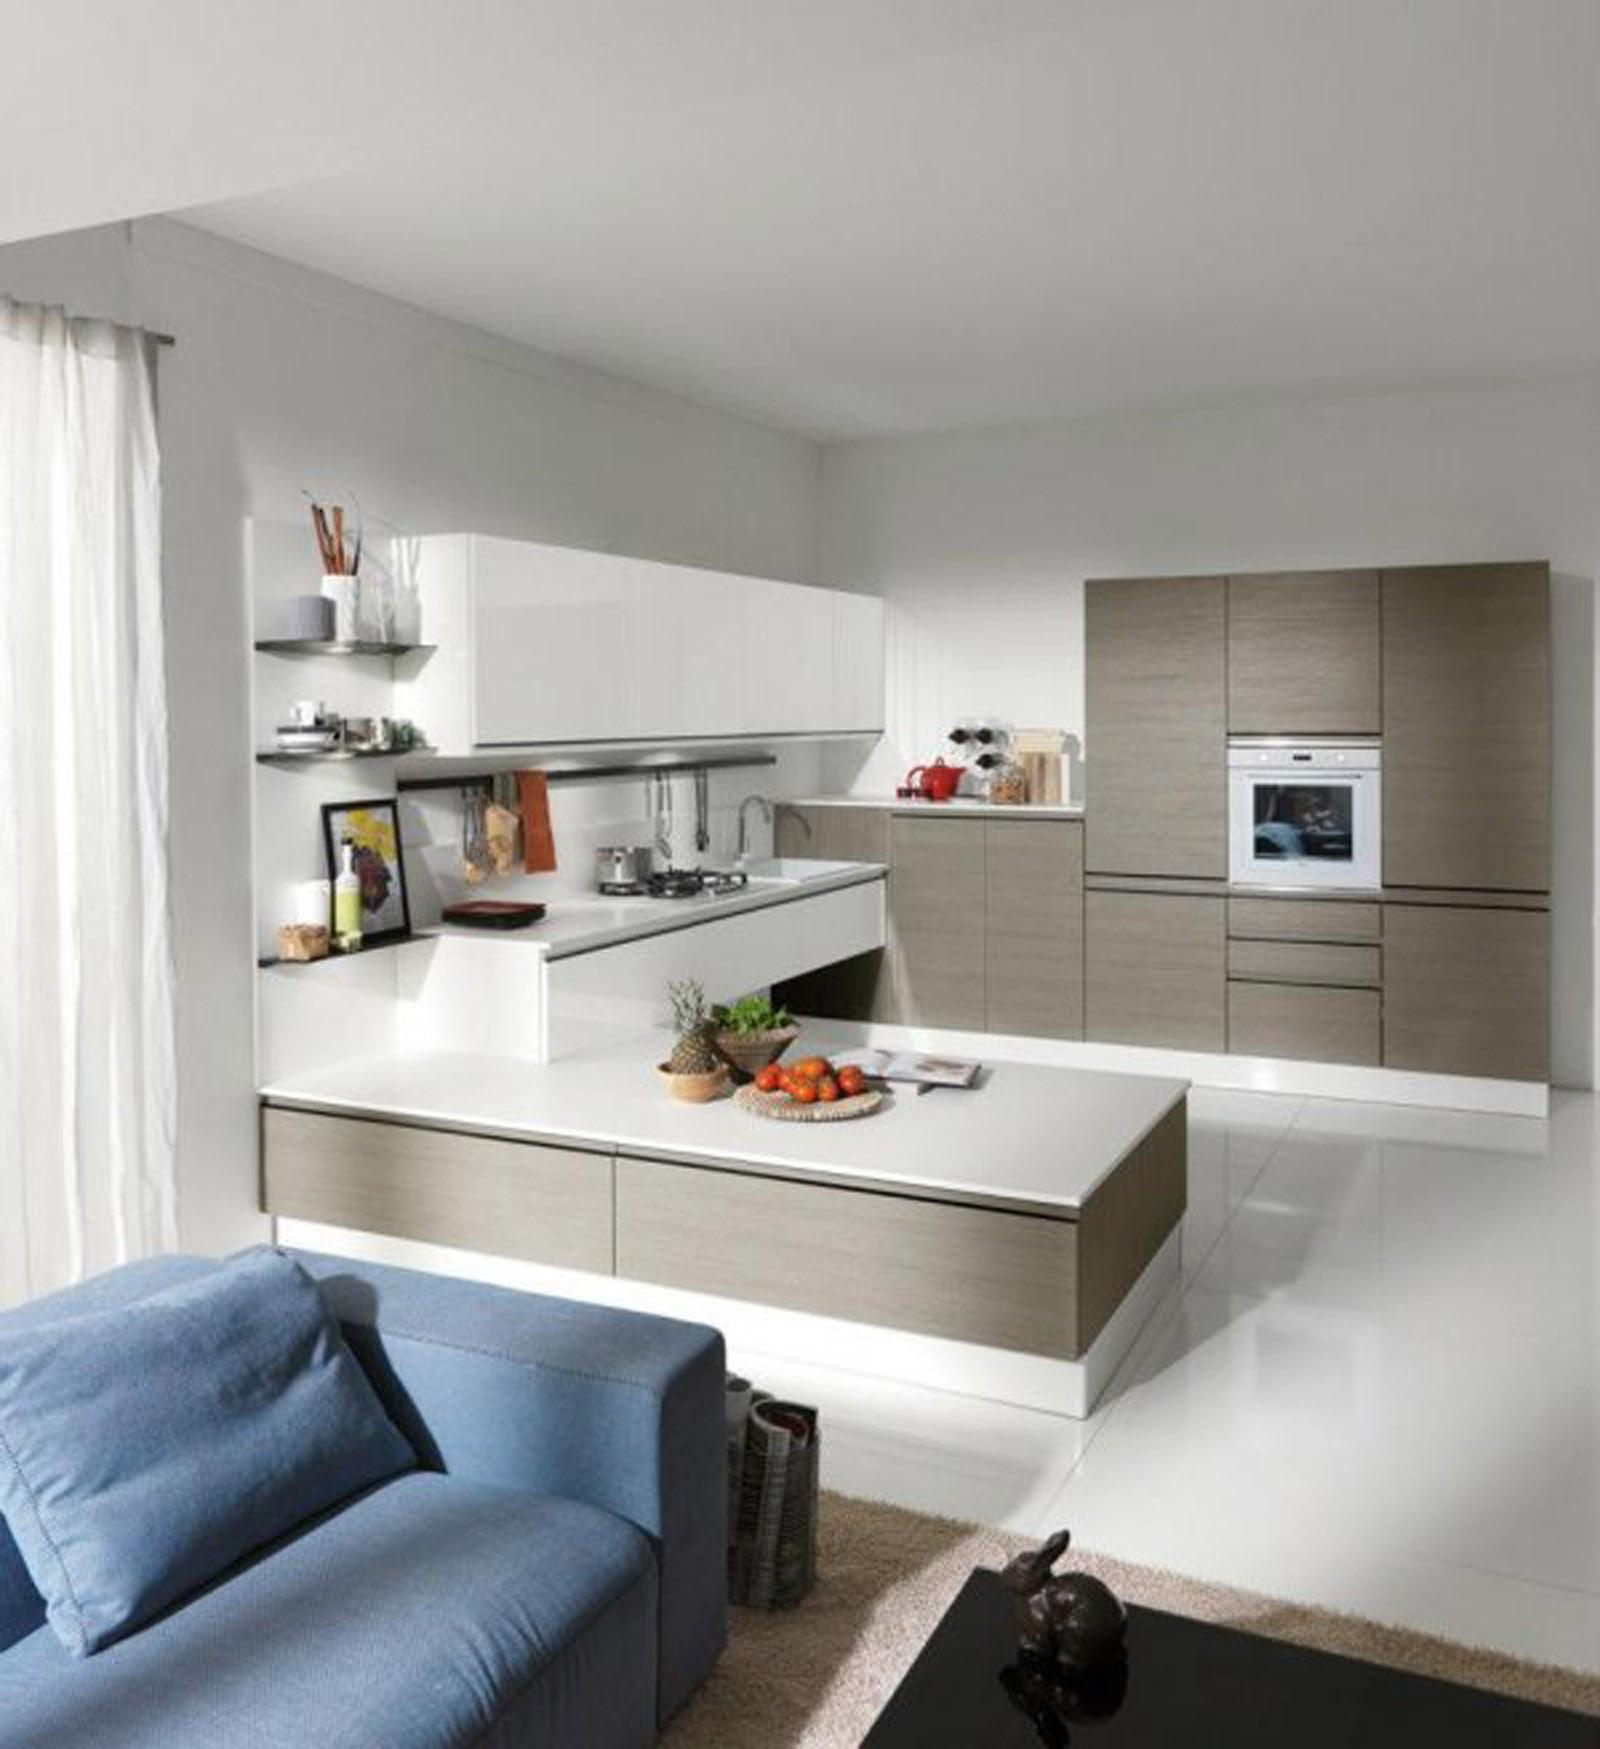 Idee per arredare una cucina a vista sicilia catania for Idee per arredare cucina soggiorno